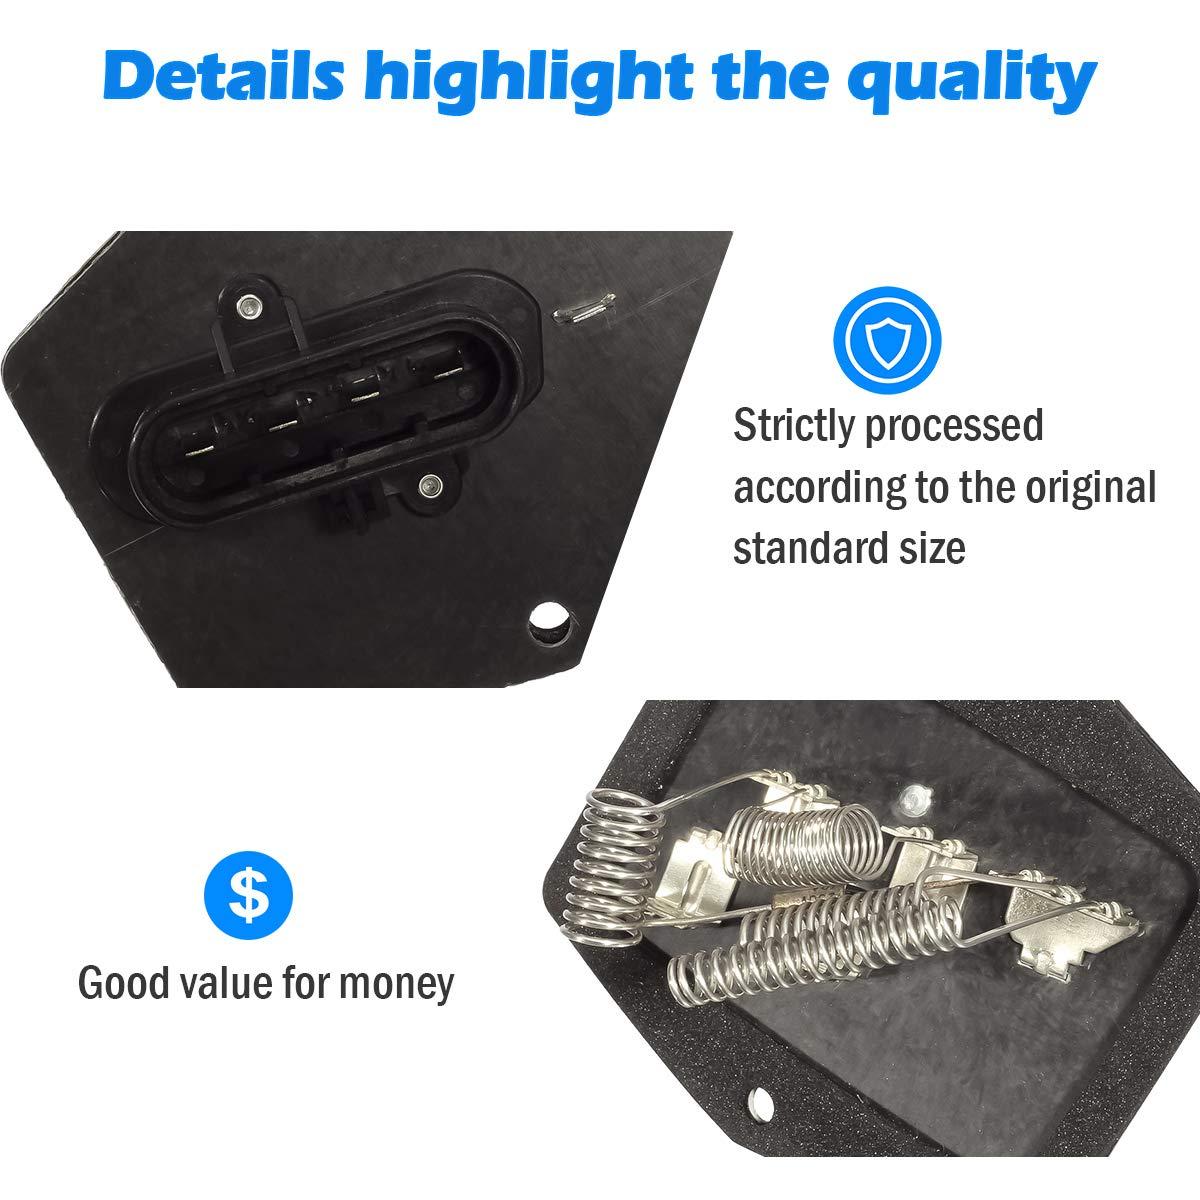 PartsSquare HVAC Blower Motor Resistor 973-003 15039098 Compatible with Chevy C1500 C2500 C3500 K1500 K2500 K3500 Pickup Suburban,GMC C//K 1500 2500 3500 Pickup Suburban 95 96 97 98 99